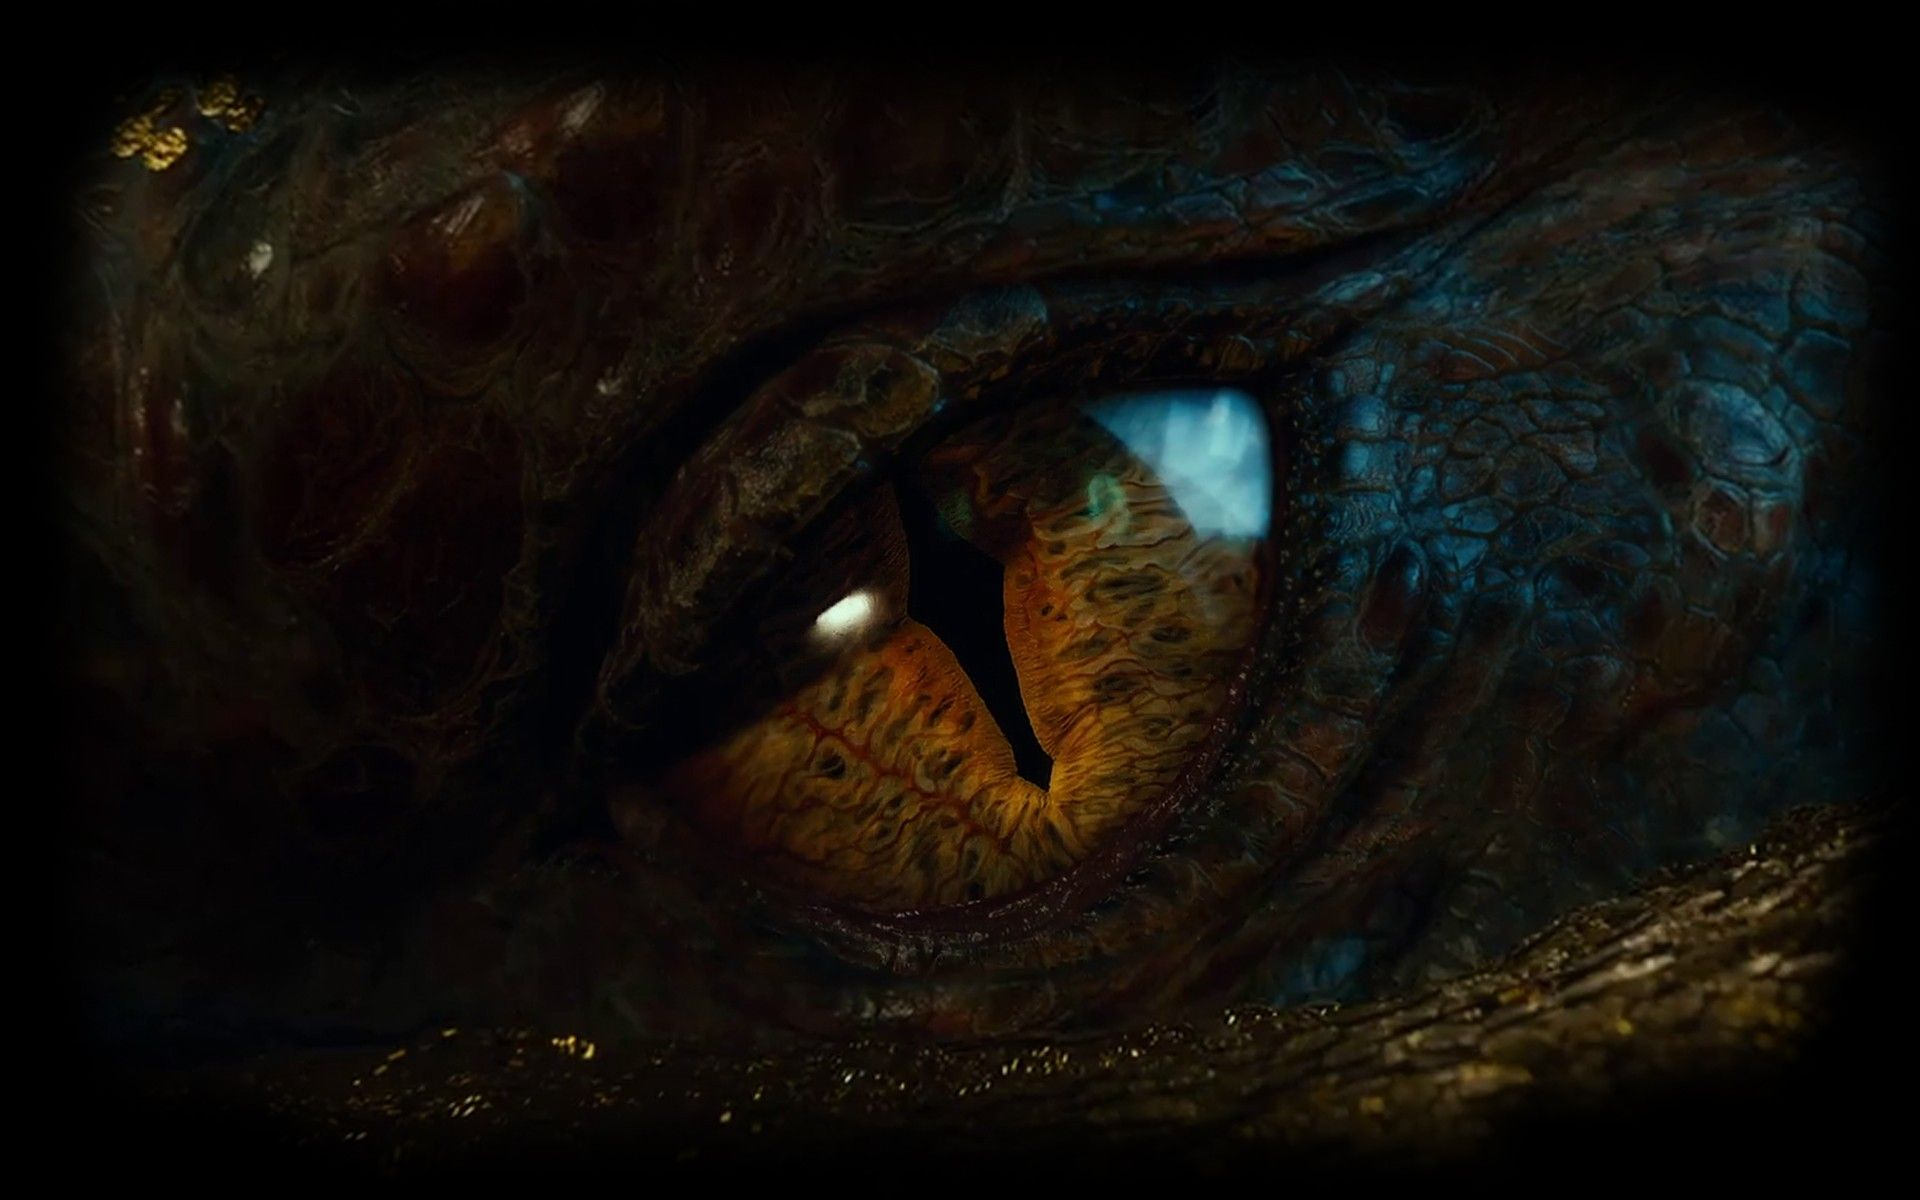 Tolkien Wallpapers The Hobbit Hobbit An Unexpected Journey Smaug